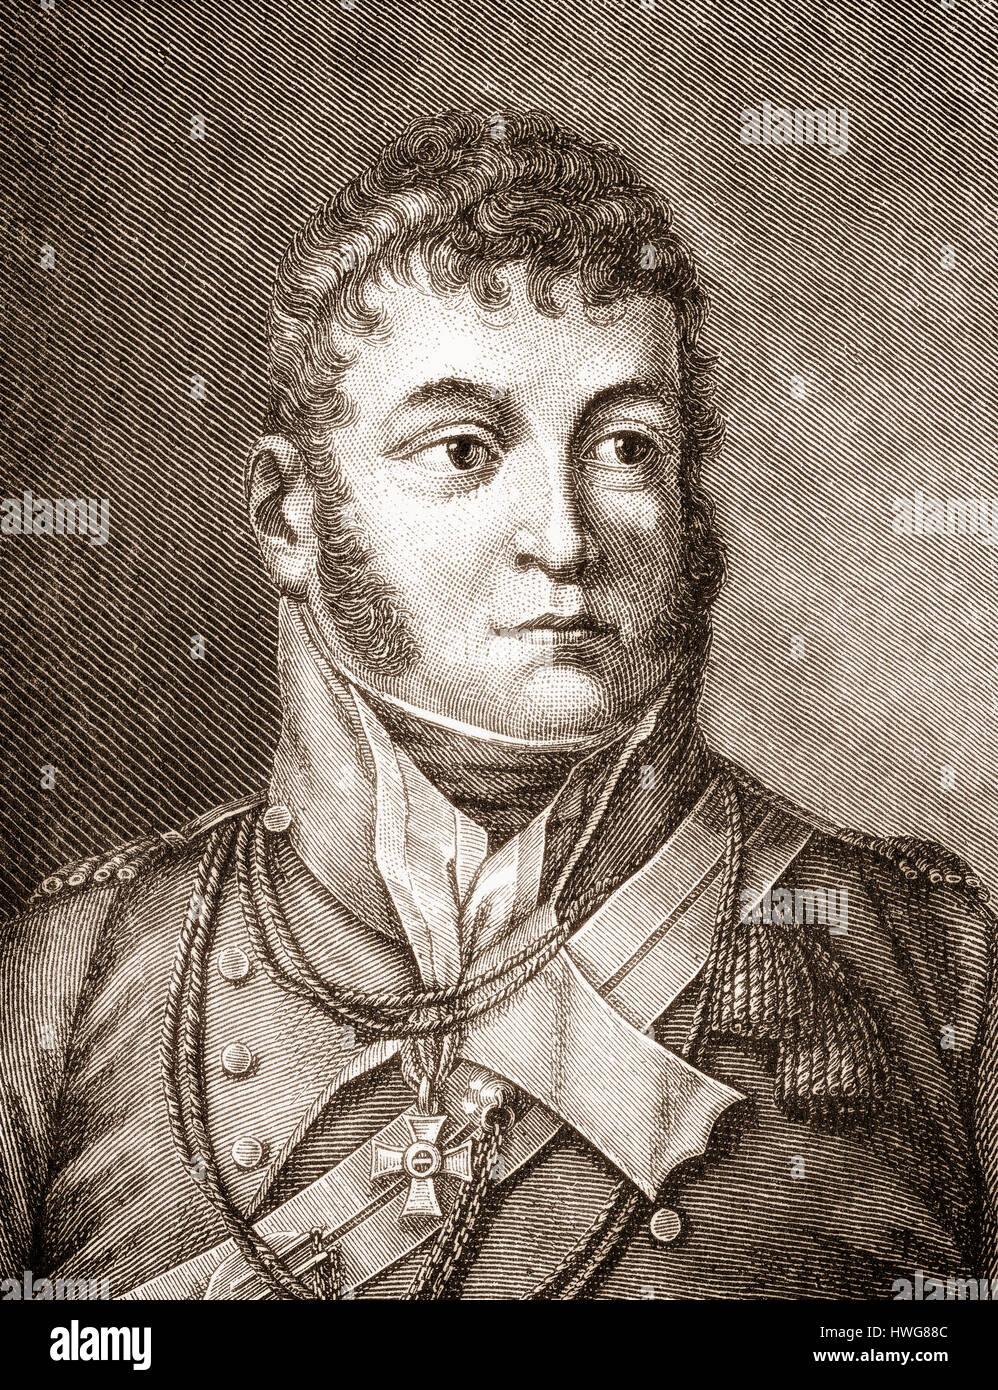 Karl Philipp Fuerst zu Schwarzenberg, 1771 - 1820, an Austrian field marshal and ambassador in Paris - Stock Image